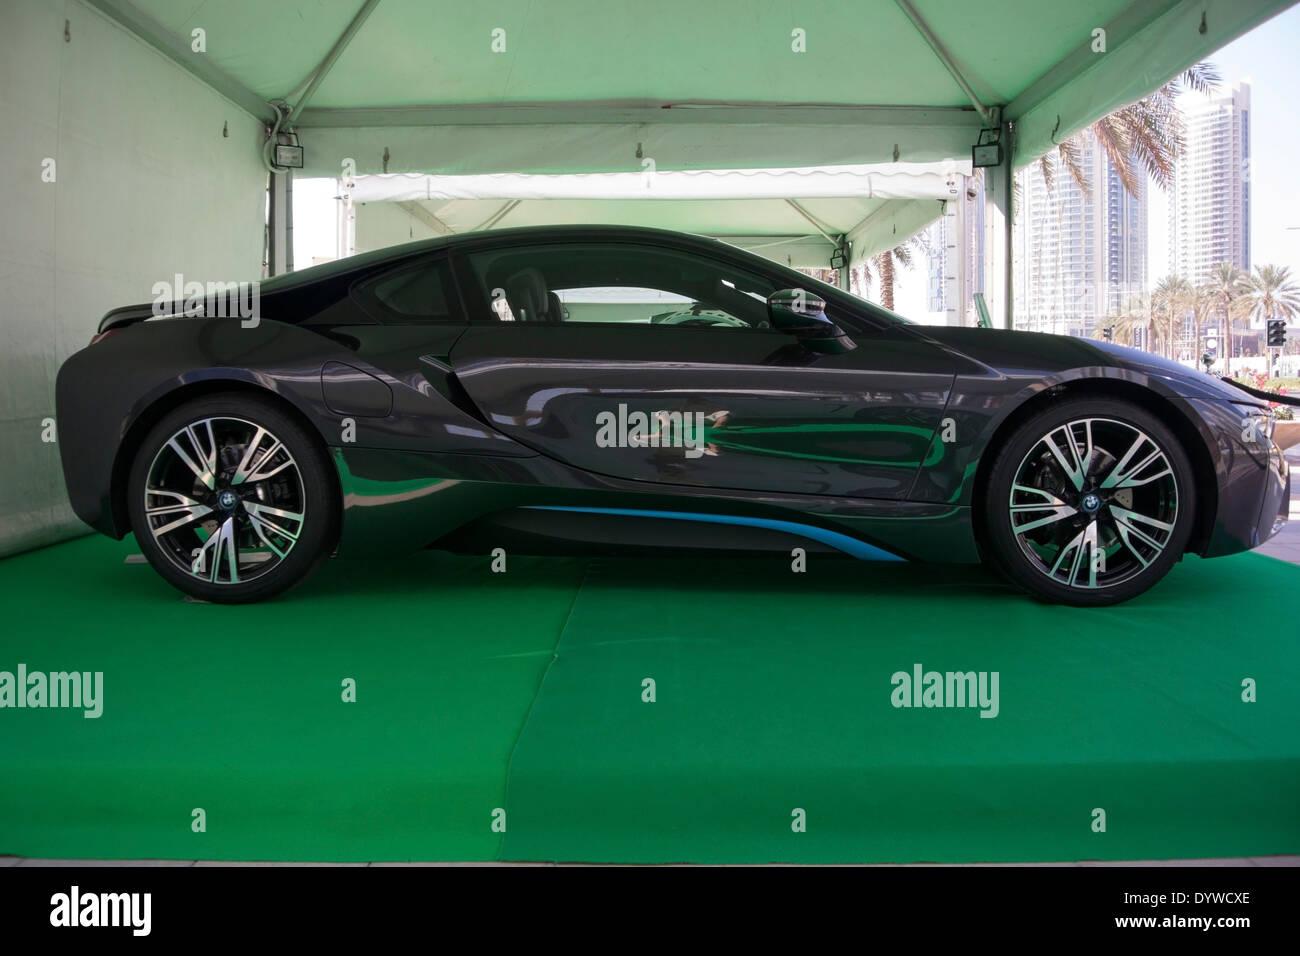 2014 Black BMW i8 Hybrid 2 door gullwing sports coupe - Stock Image